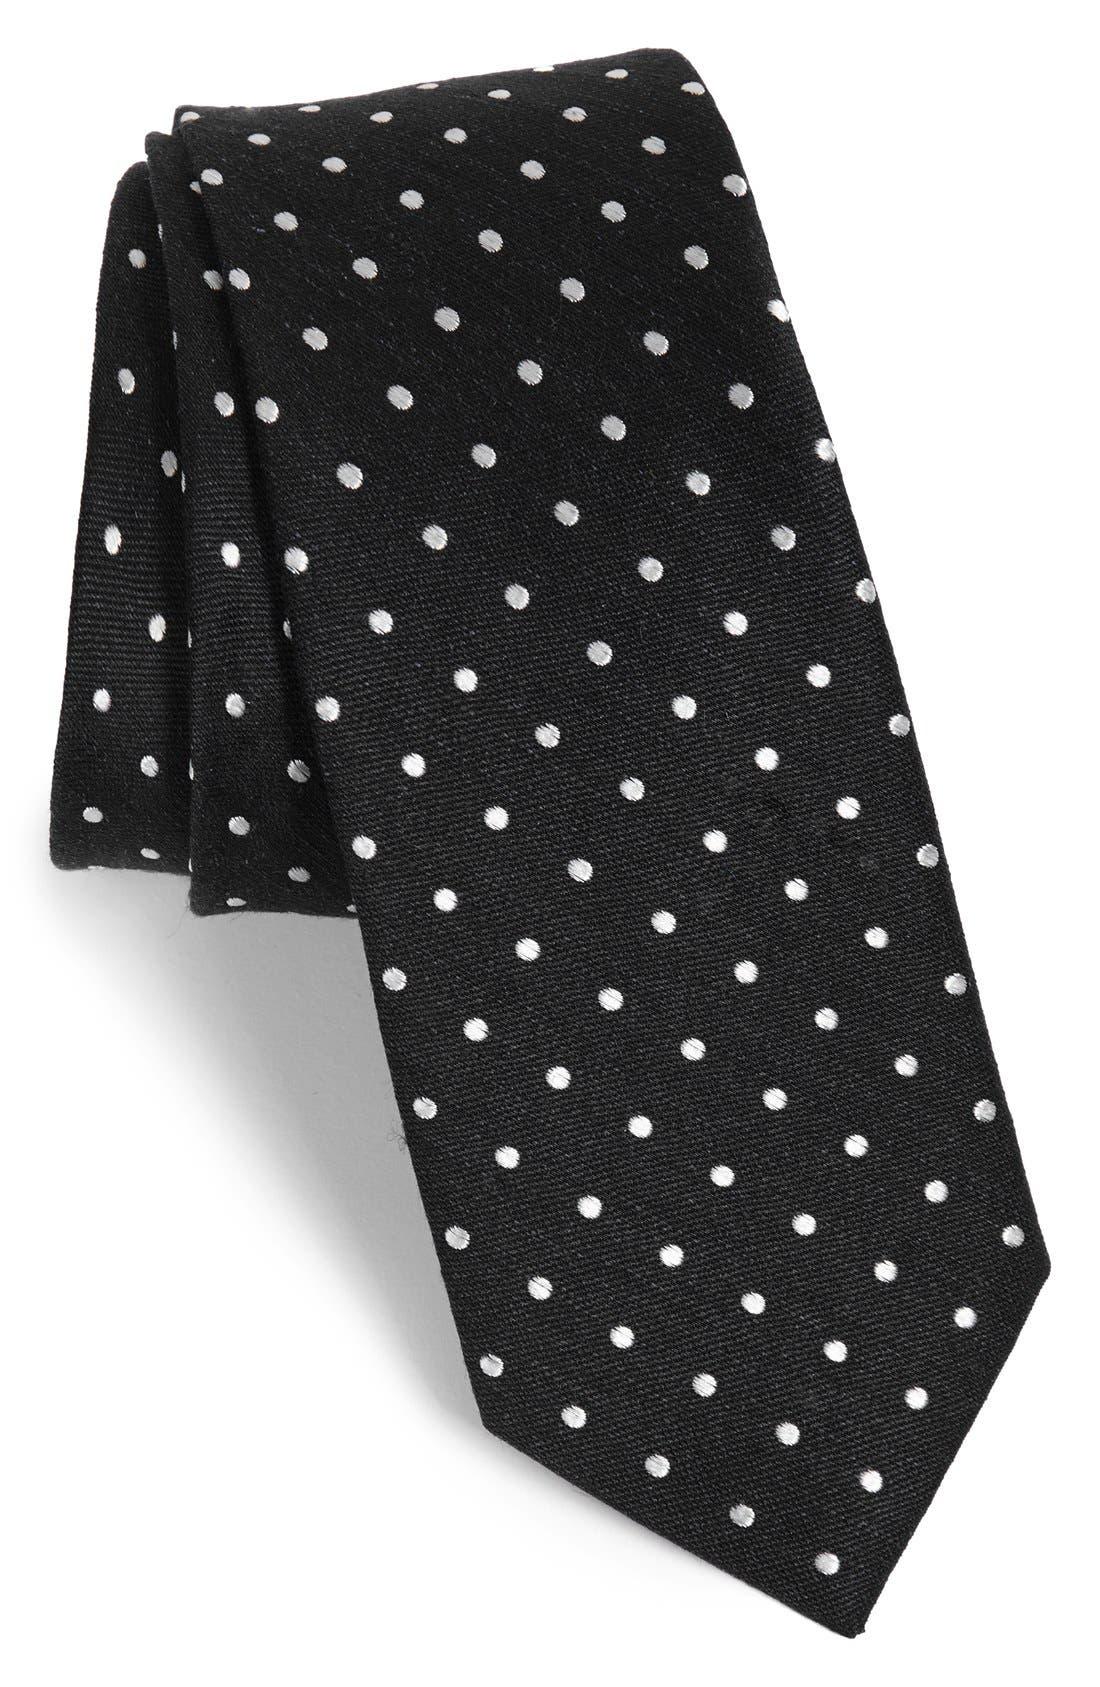 The Tie Bar Dot Silk & Linen Tie